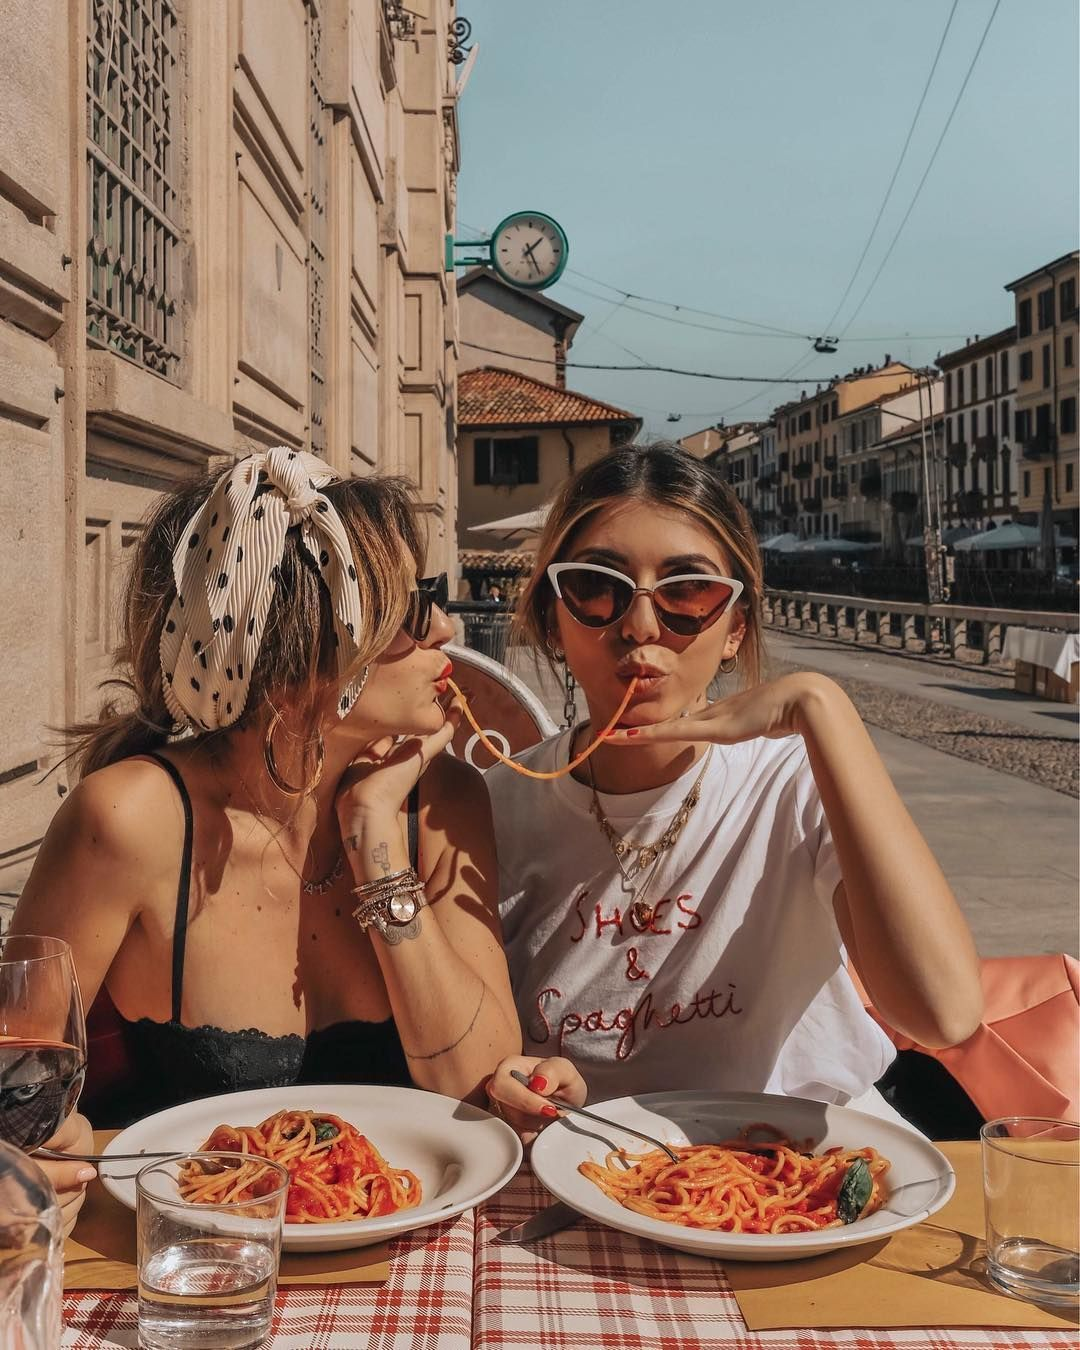 Alice Op Instagram Italiaanse Vibes Spaghetti Is Altijd Een Goed Idee Beter Indien Gedeeld Me Fotoposen Fotoshooting Freunde Bester Freund Fotoshooting